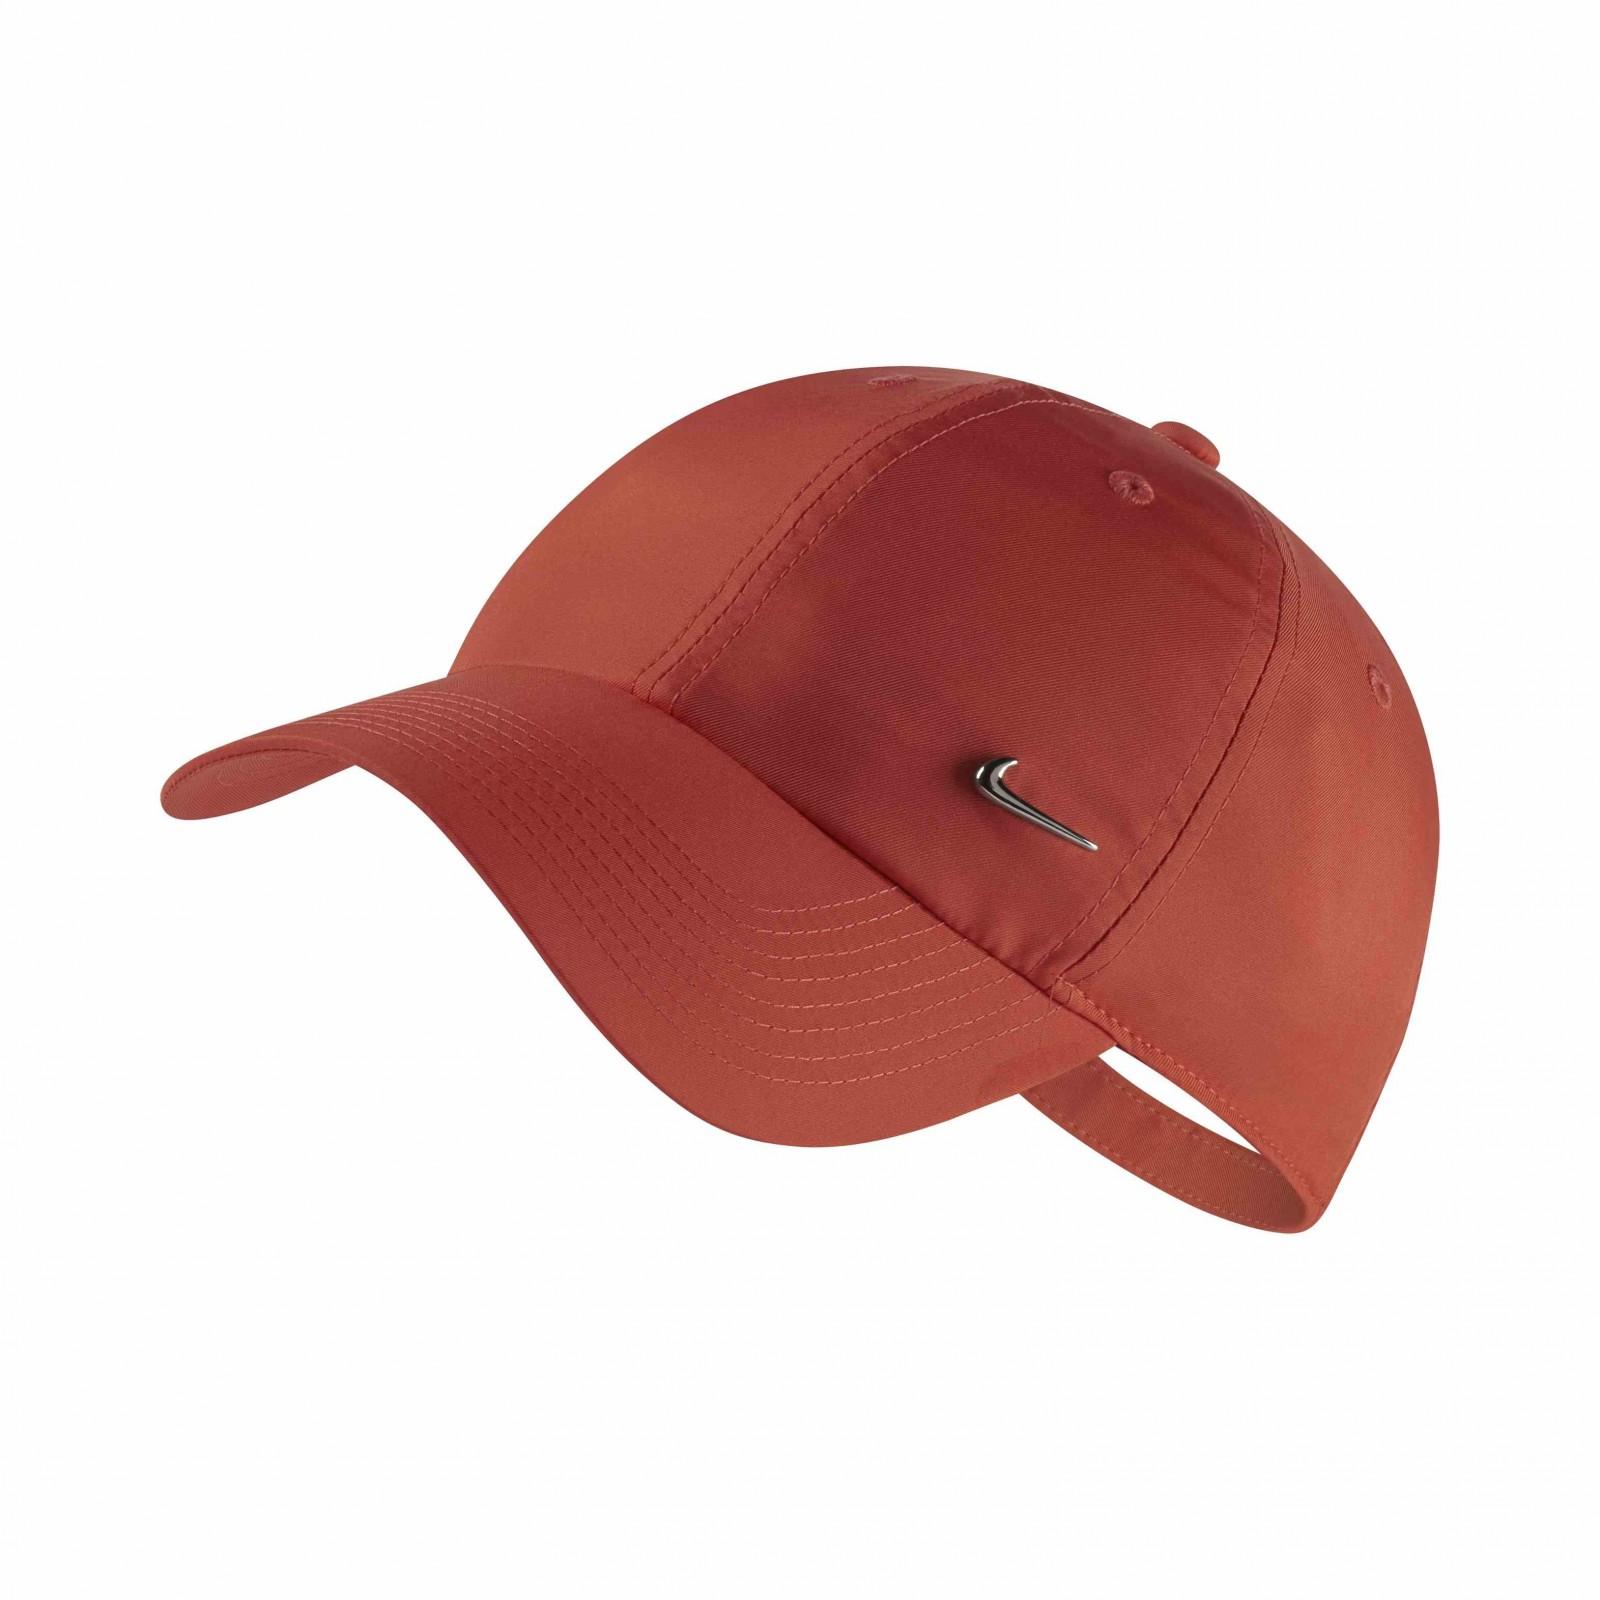 Nike U nsw h86 cap nk metal swoosh RUSH CORAL METALLIC SILVER - Glami.cz 4da127a540